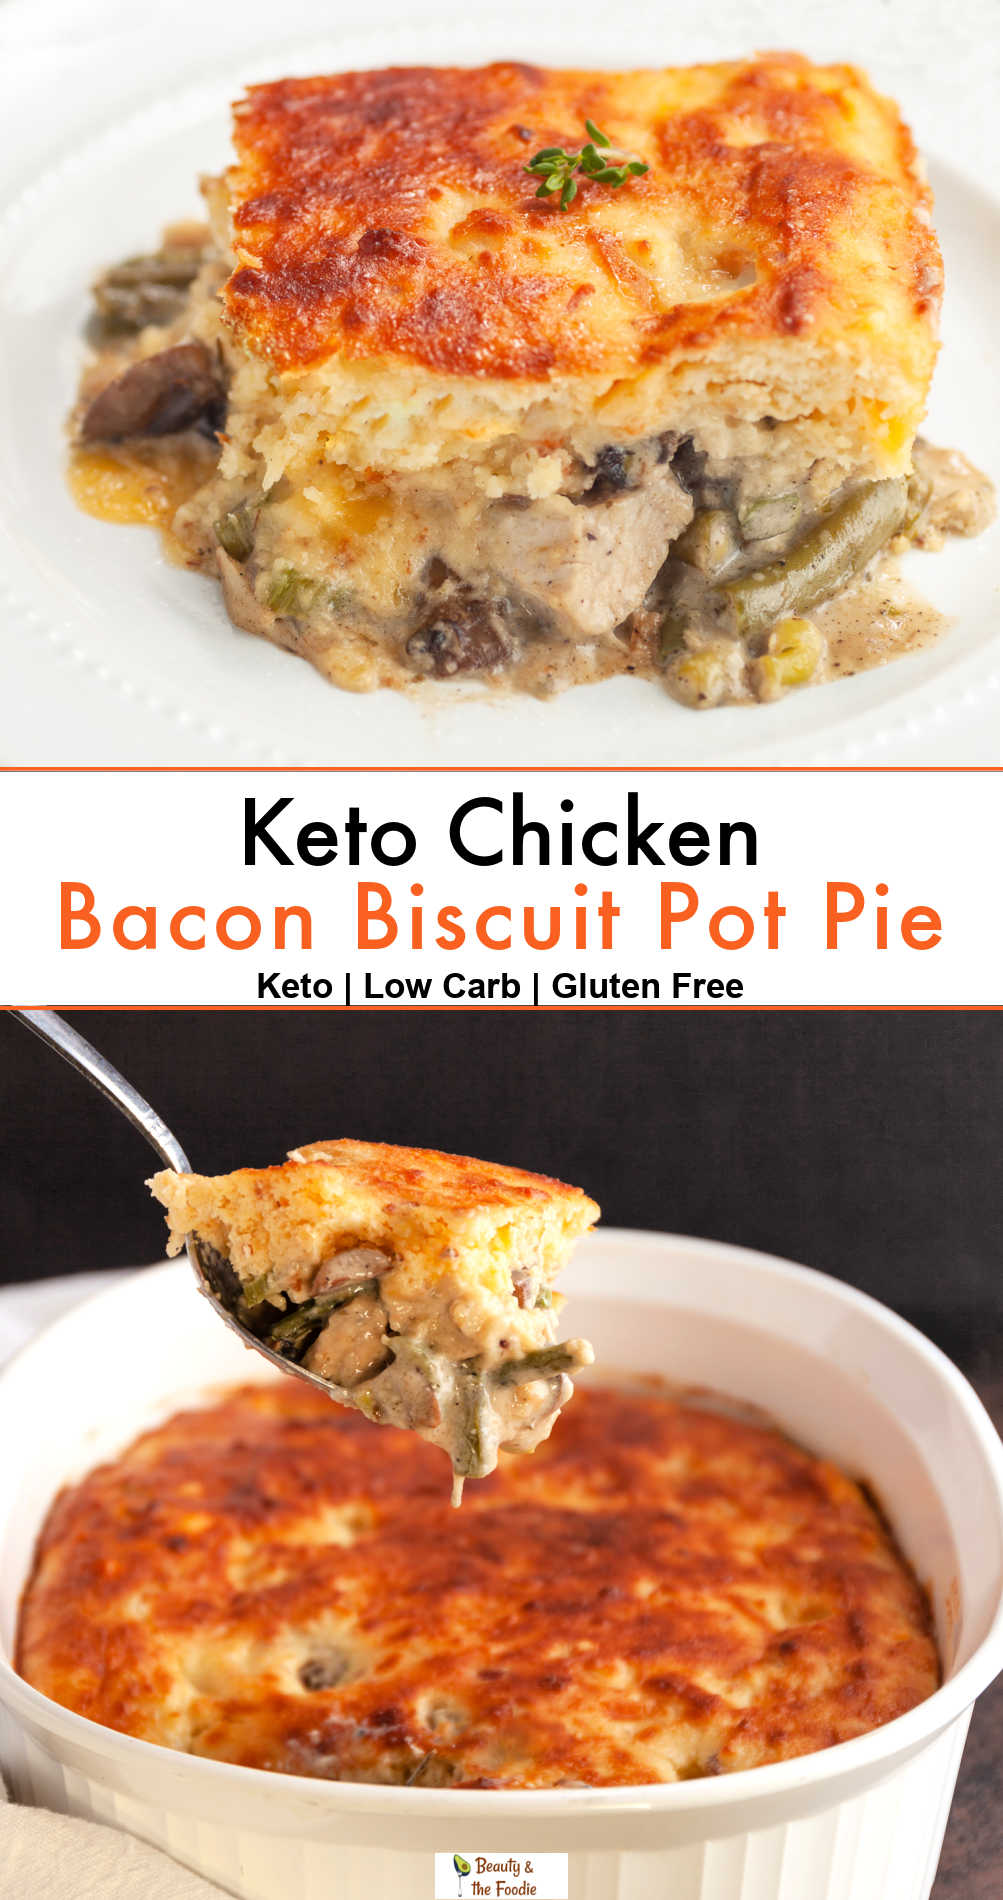 A keto pot pie with chicken, veggies & a biscuit crust.